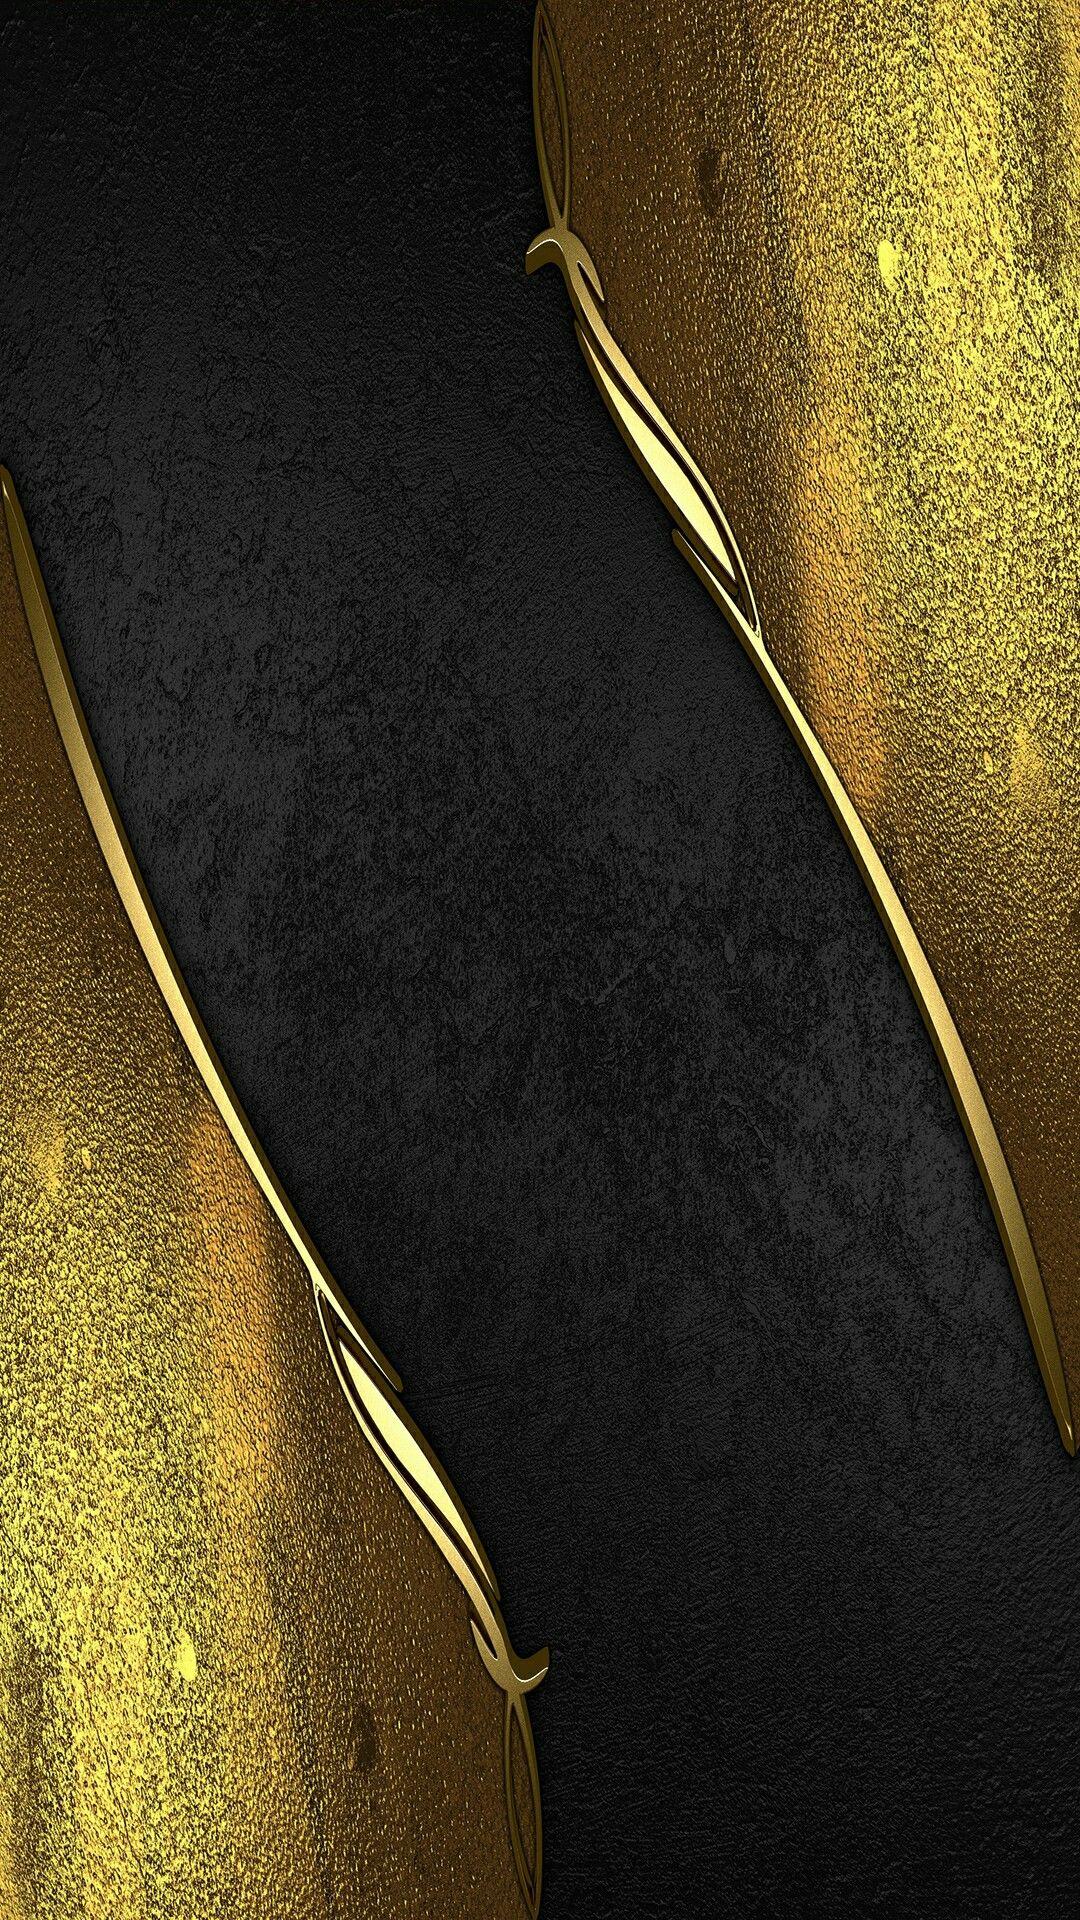 Pin by Erkan Bildirici on gold wallpaper Pinterest